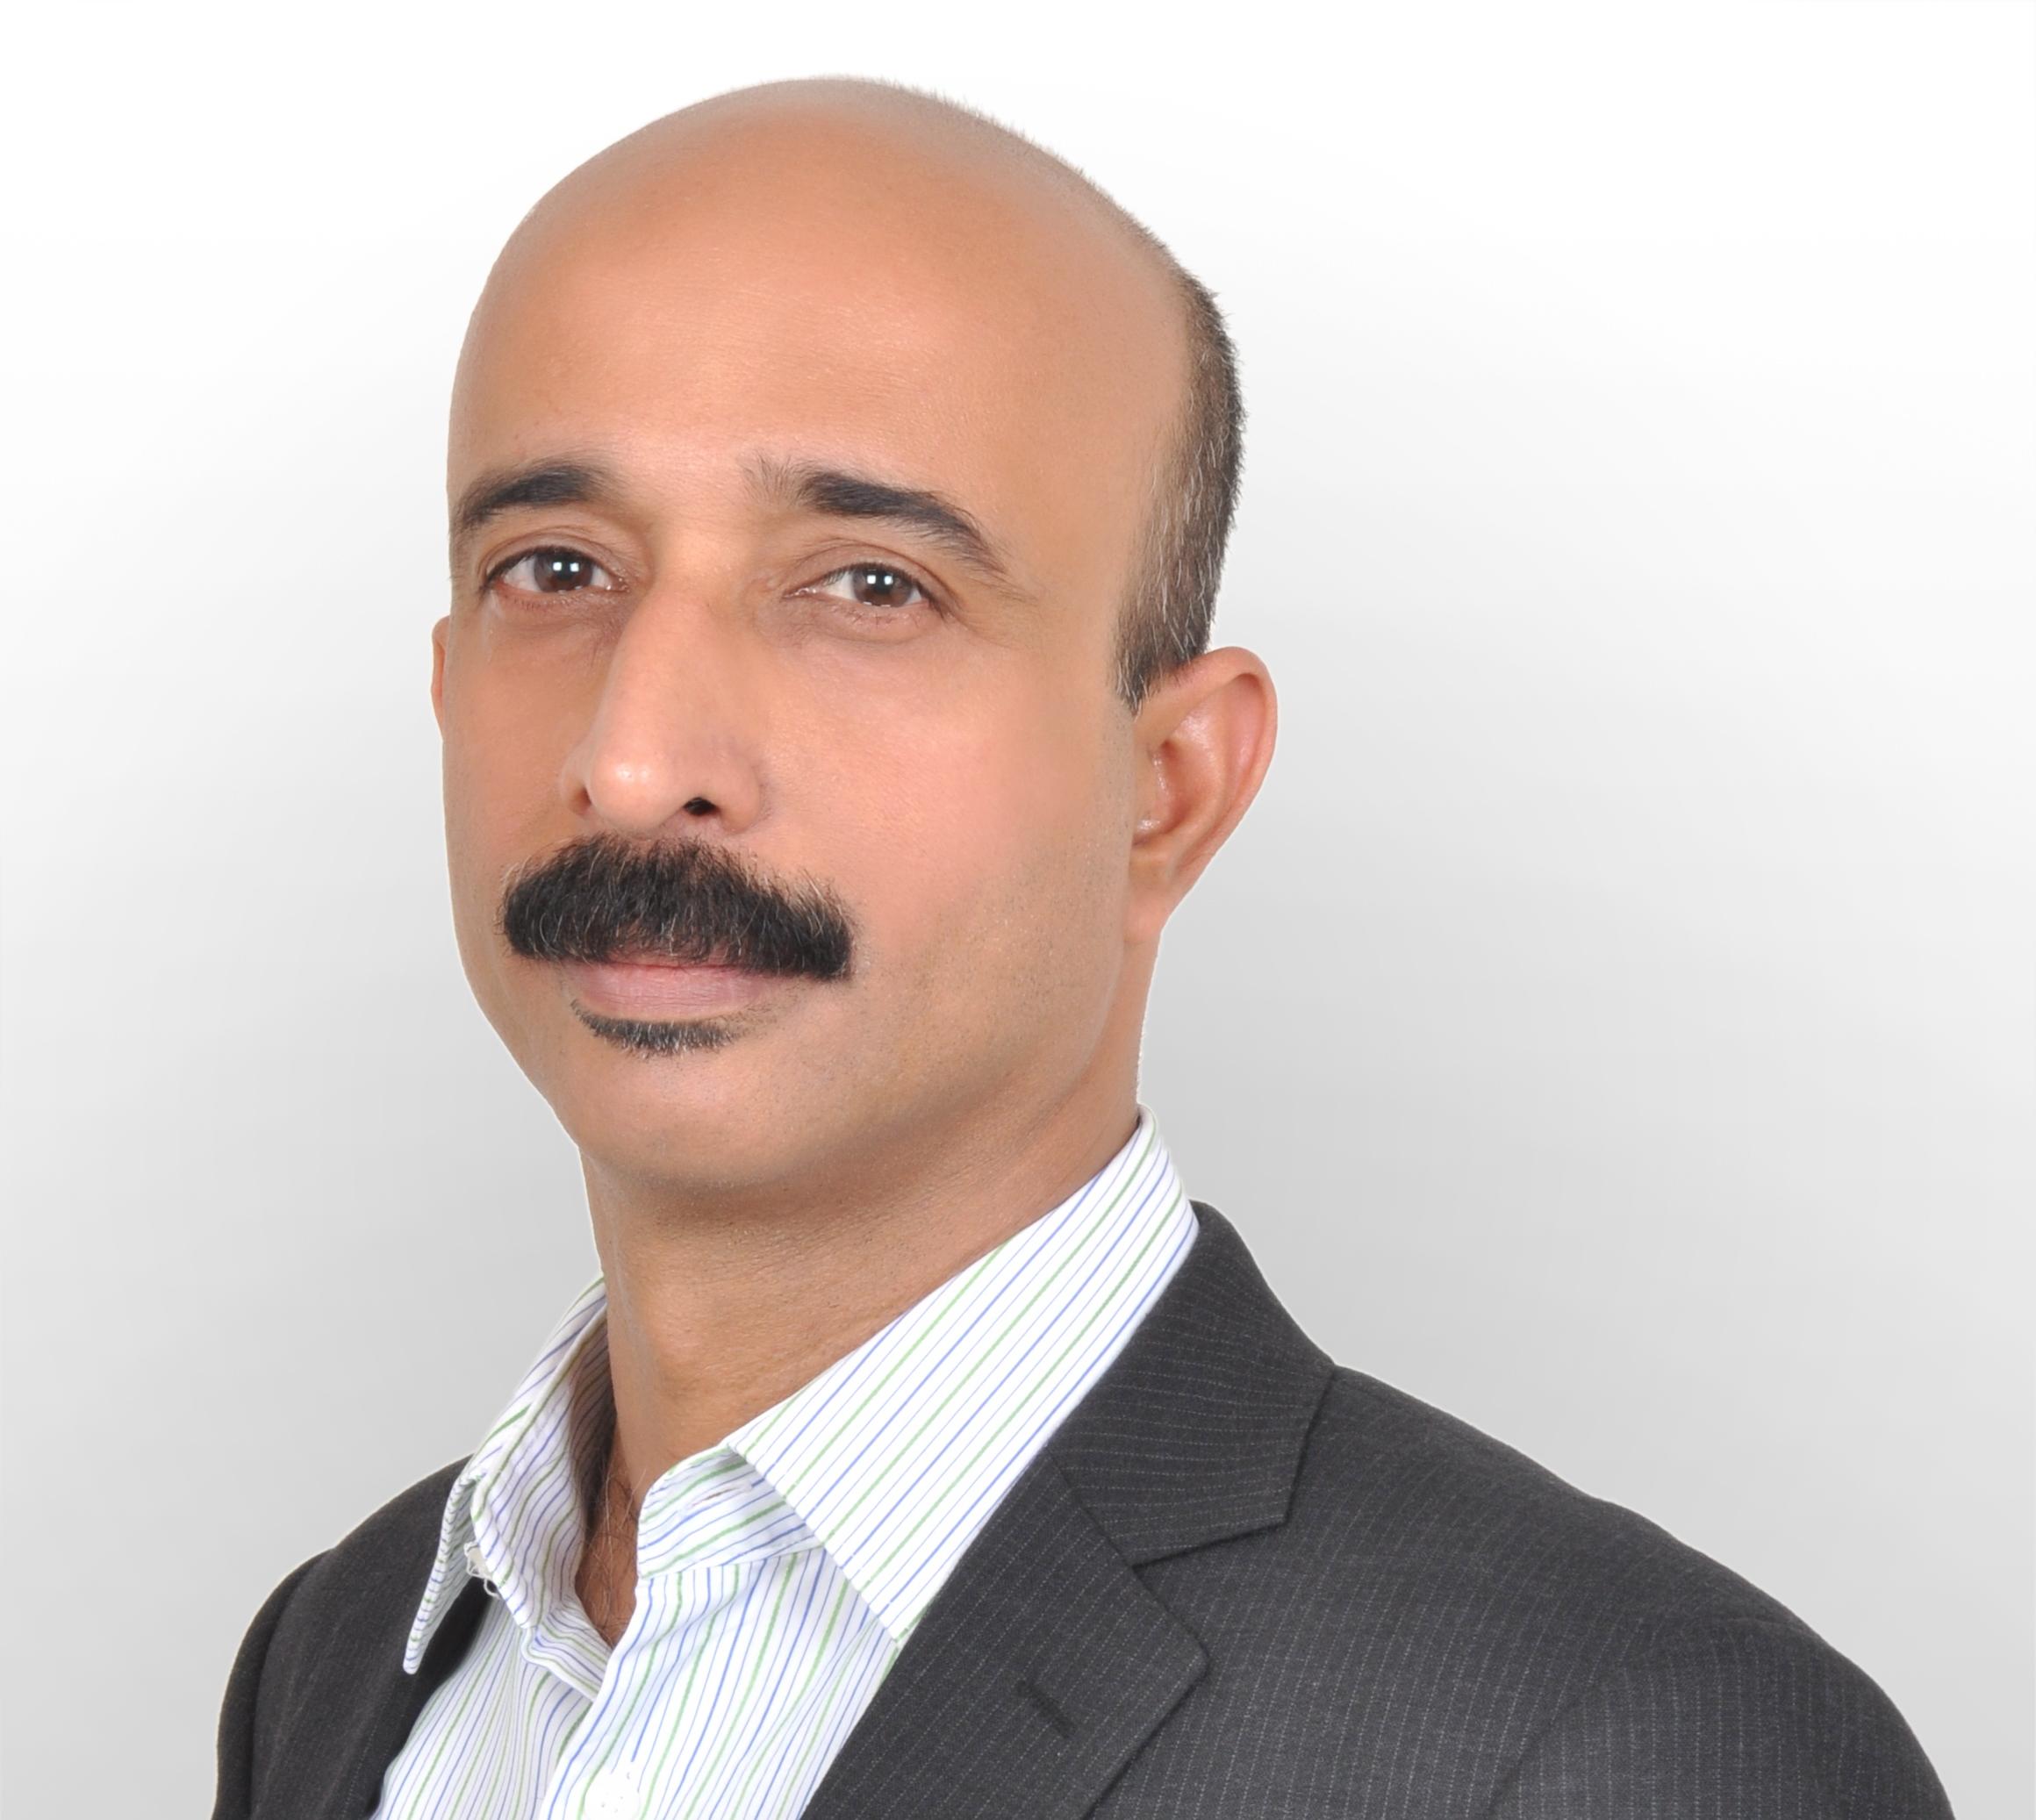 Sanjay Chitkara